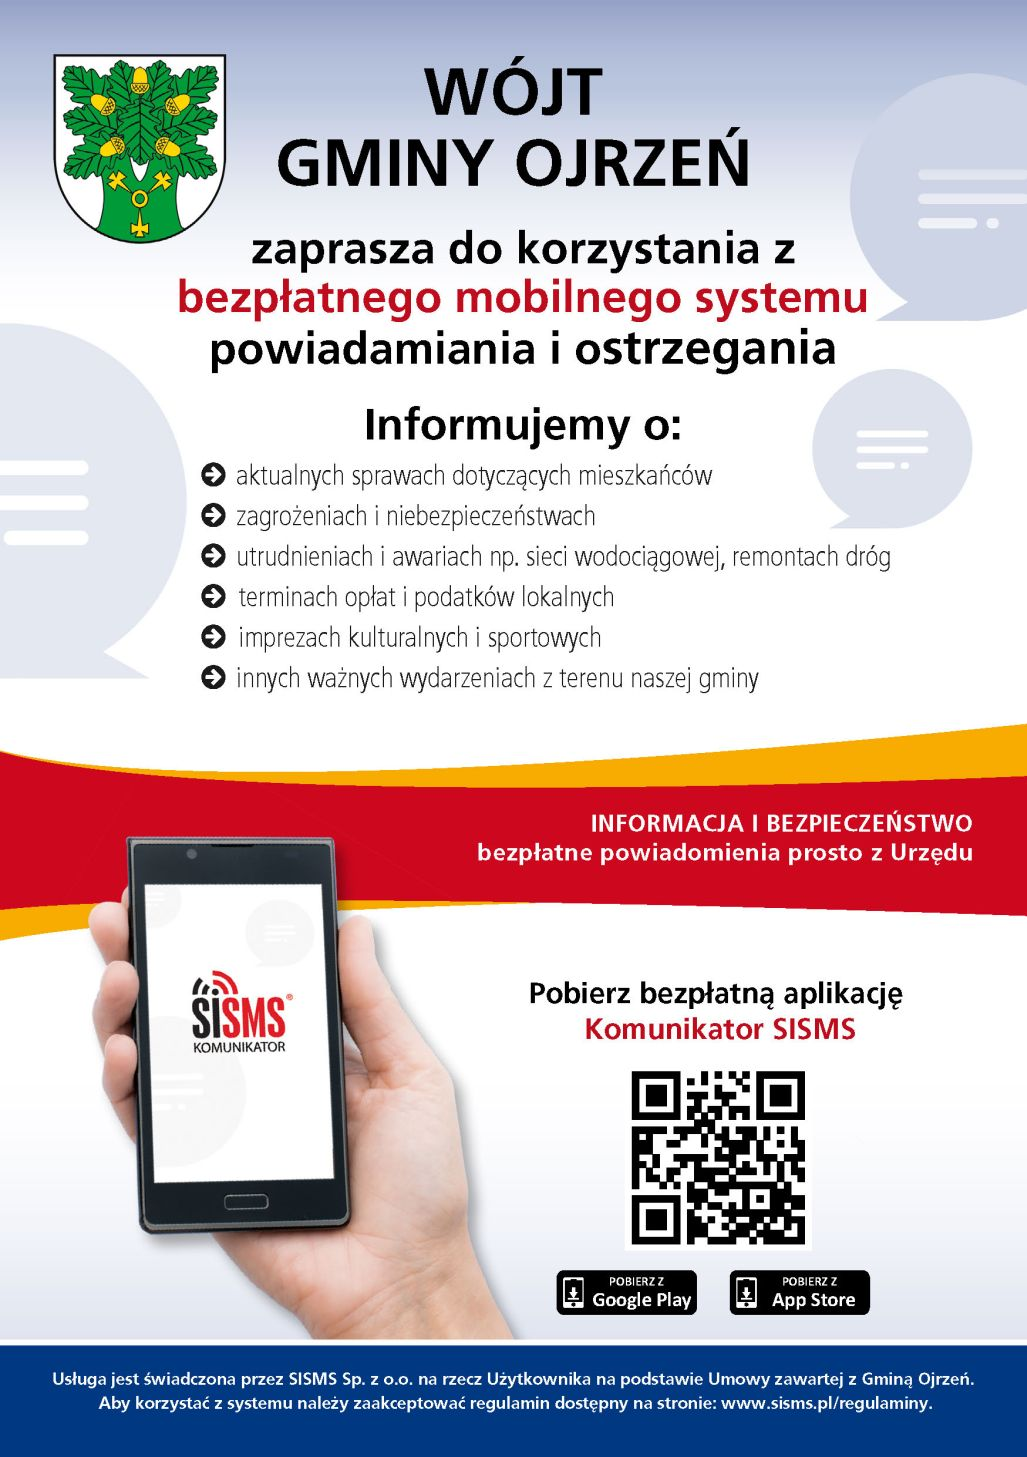 ulotka_sisms_strona_1